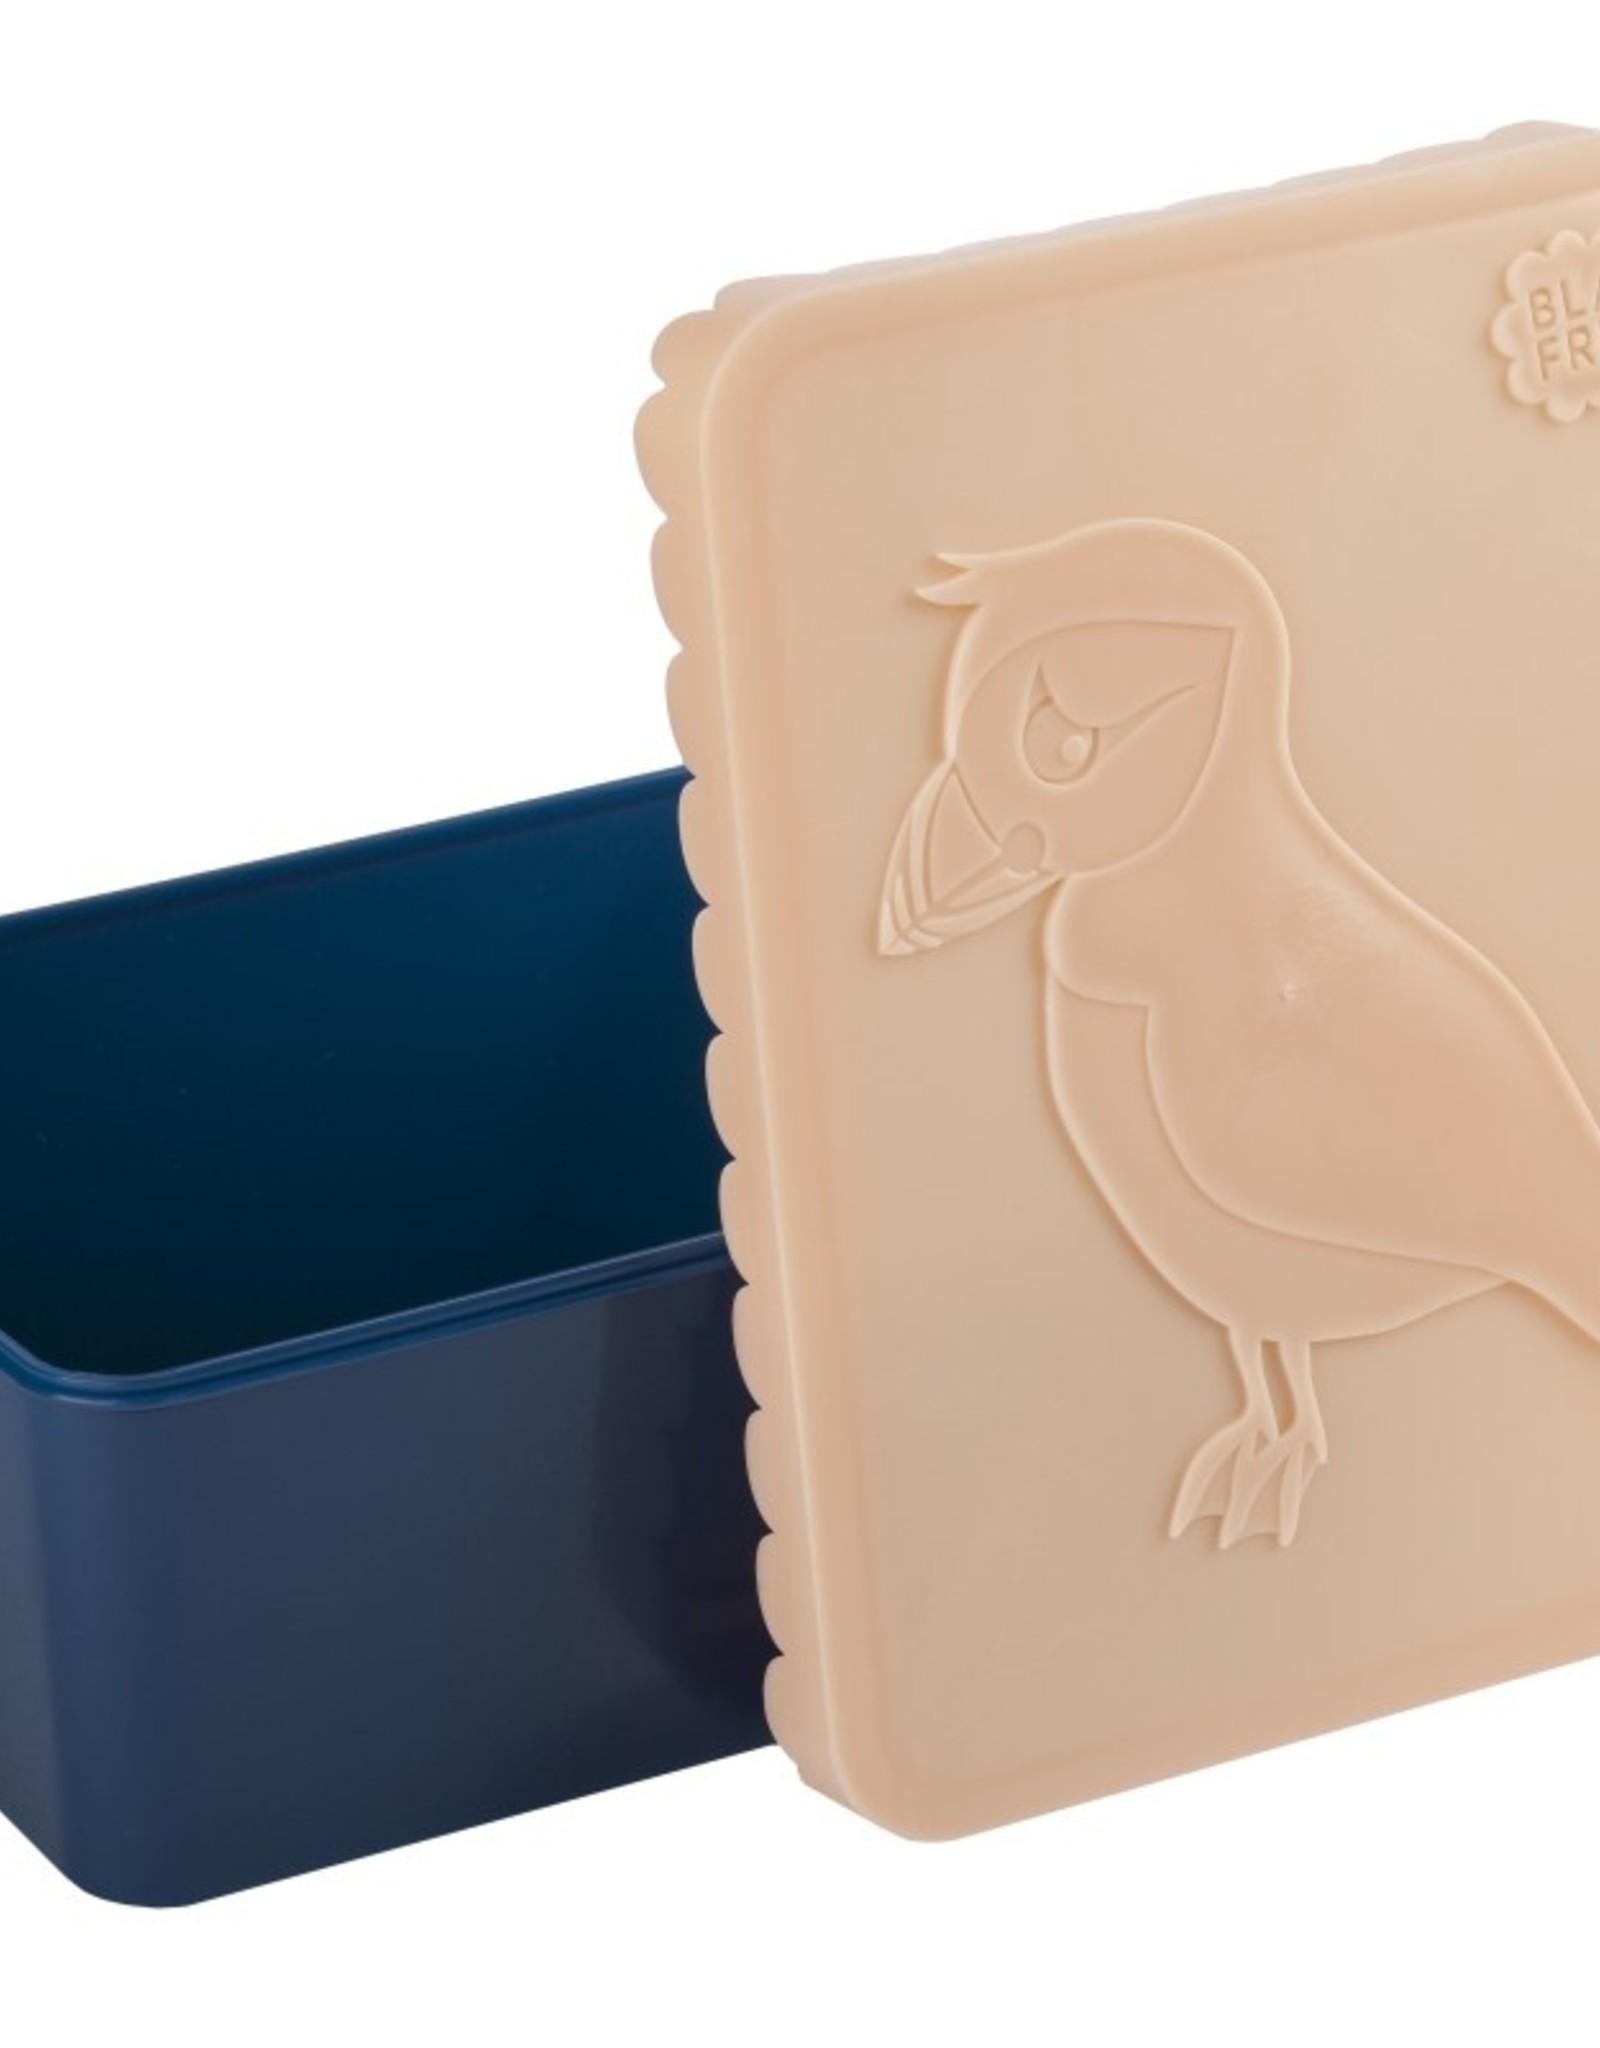 BLAFRE Blafre - Lunch box - Puffin - Peach